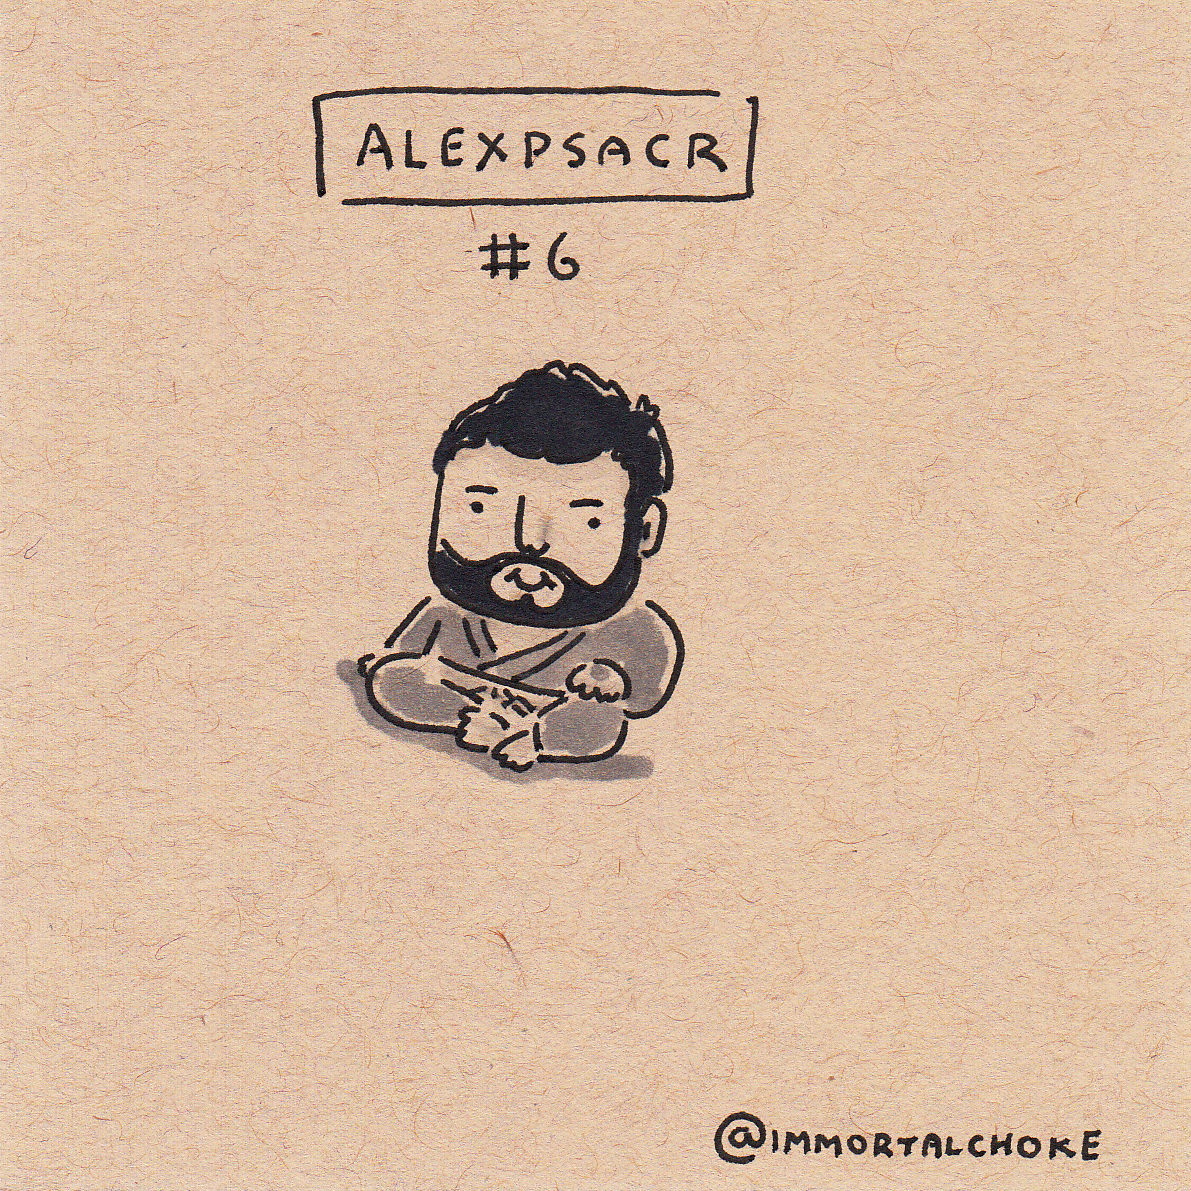 6---alexpsacr.jpg